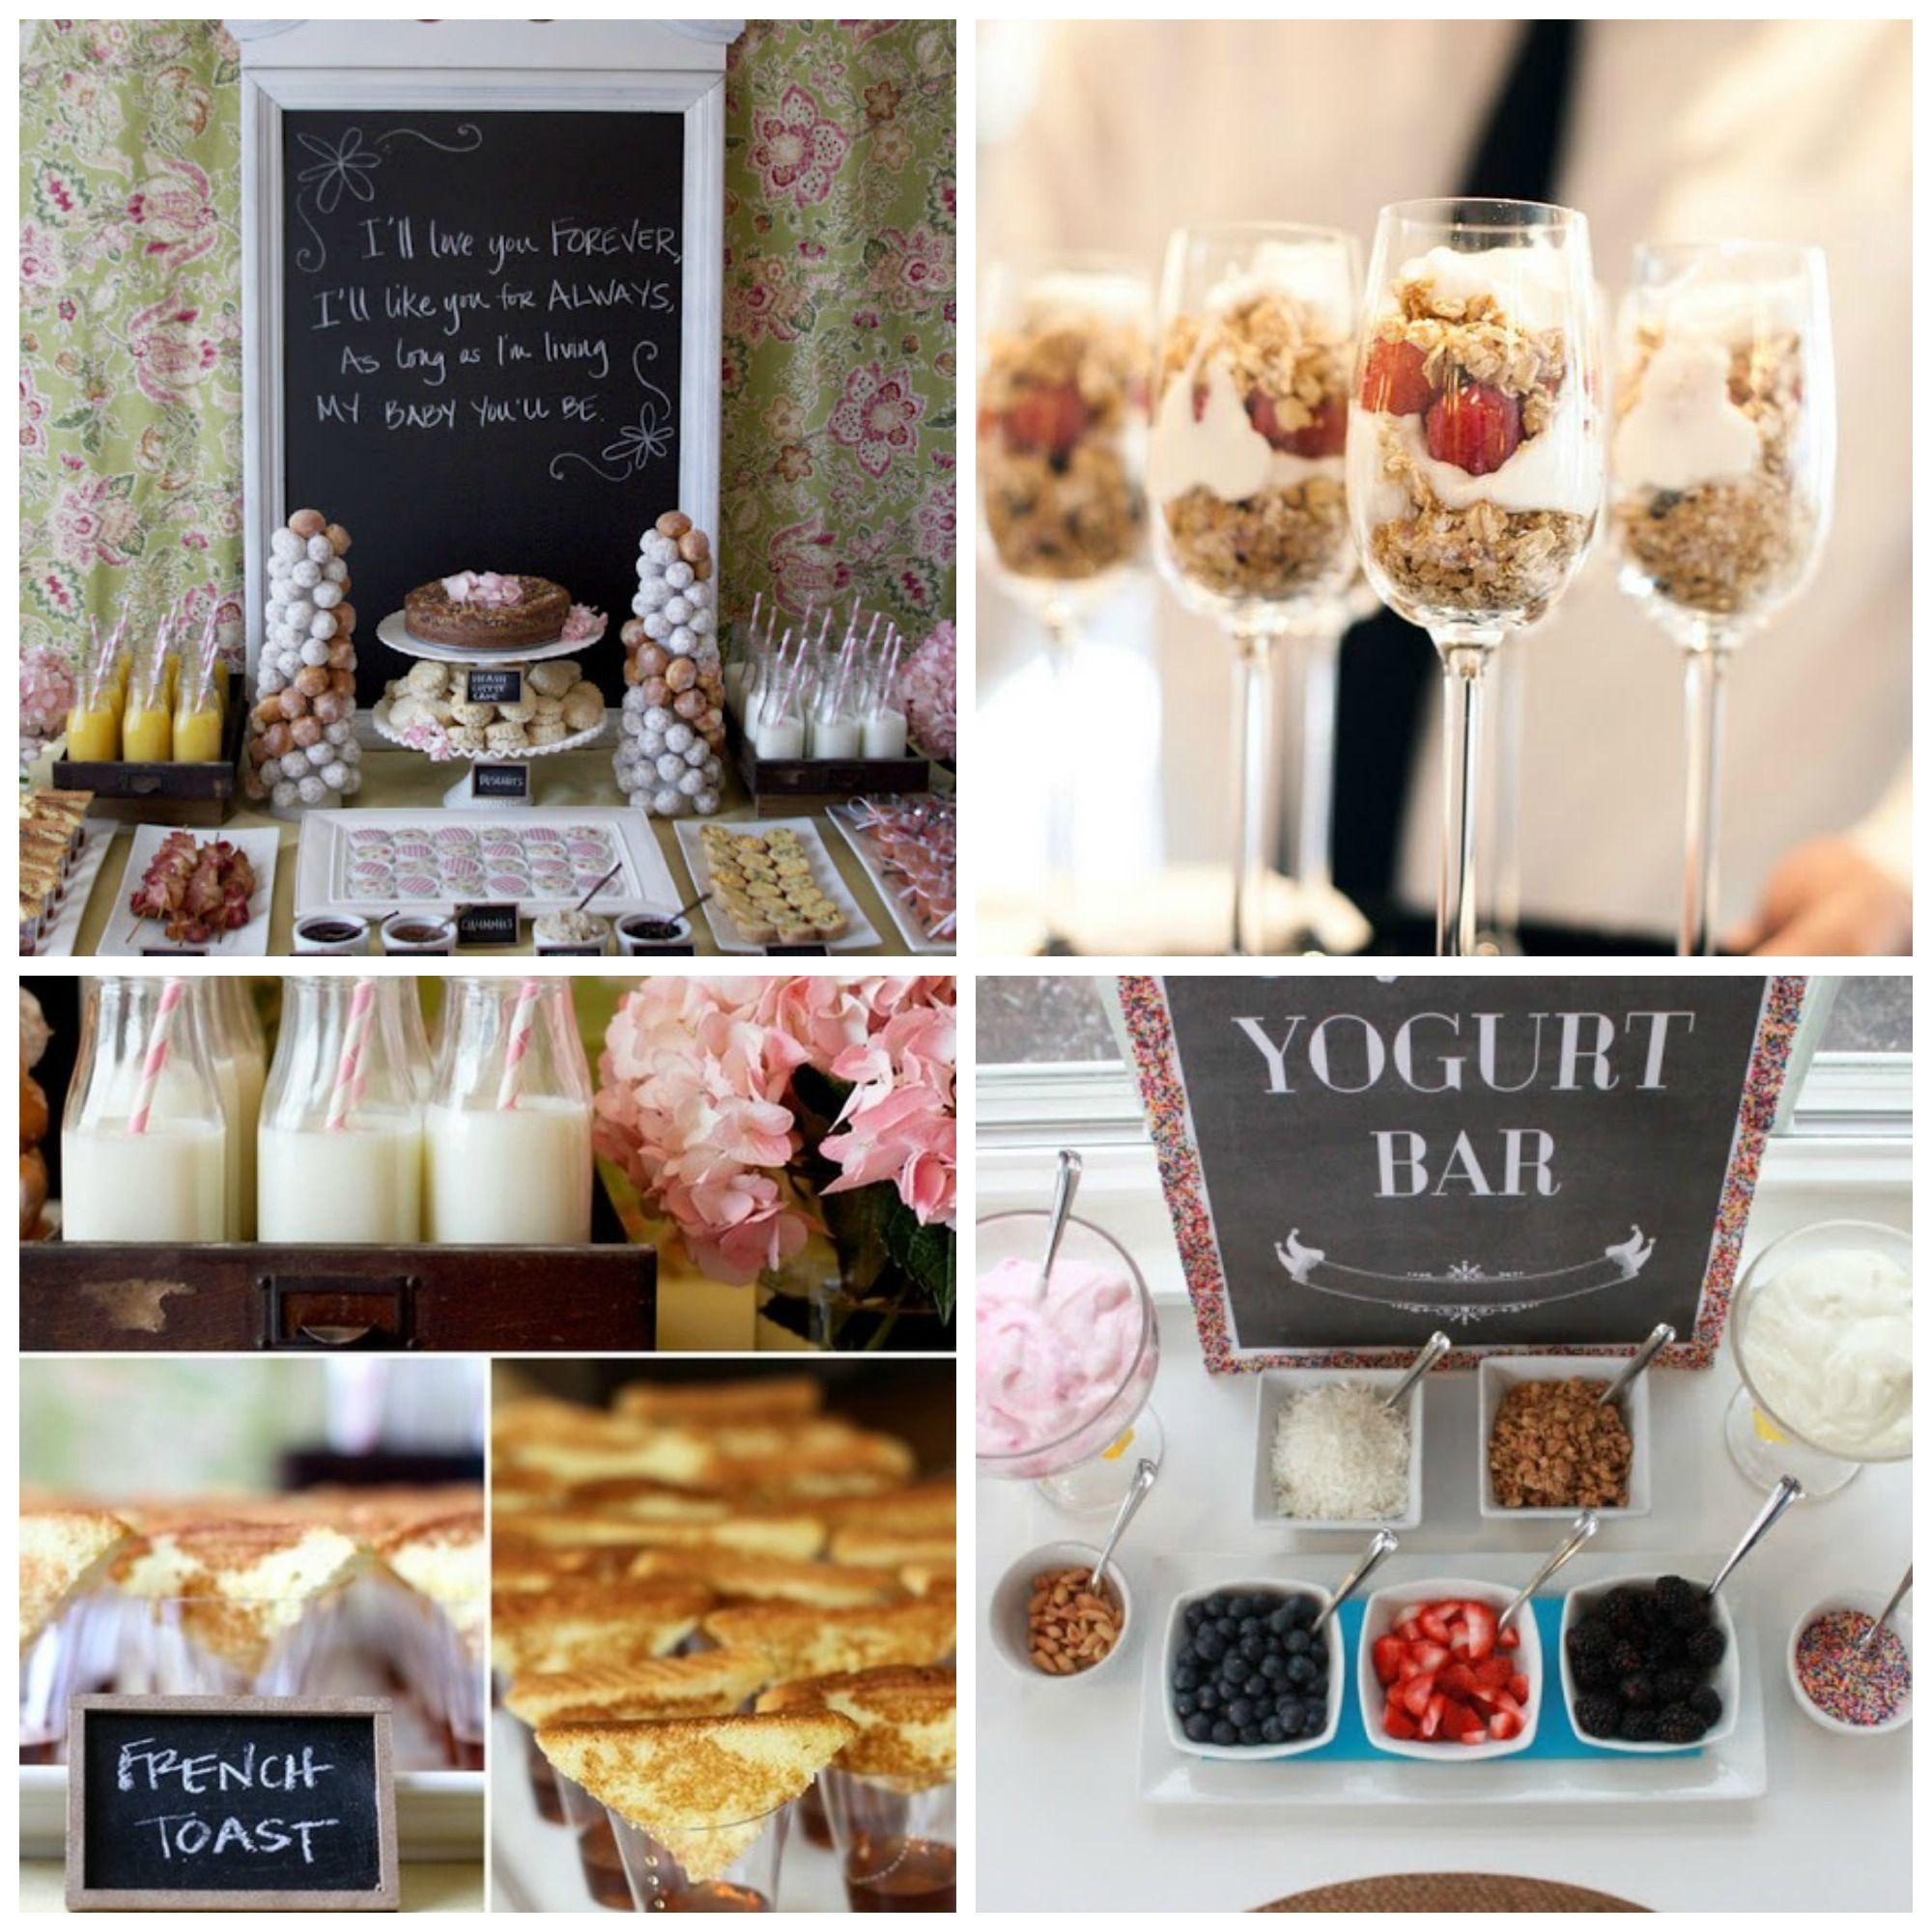 After Wedding Brunch Ideas: Image Result For Engagement Party Brunch Ideas